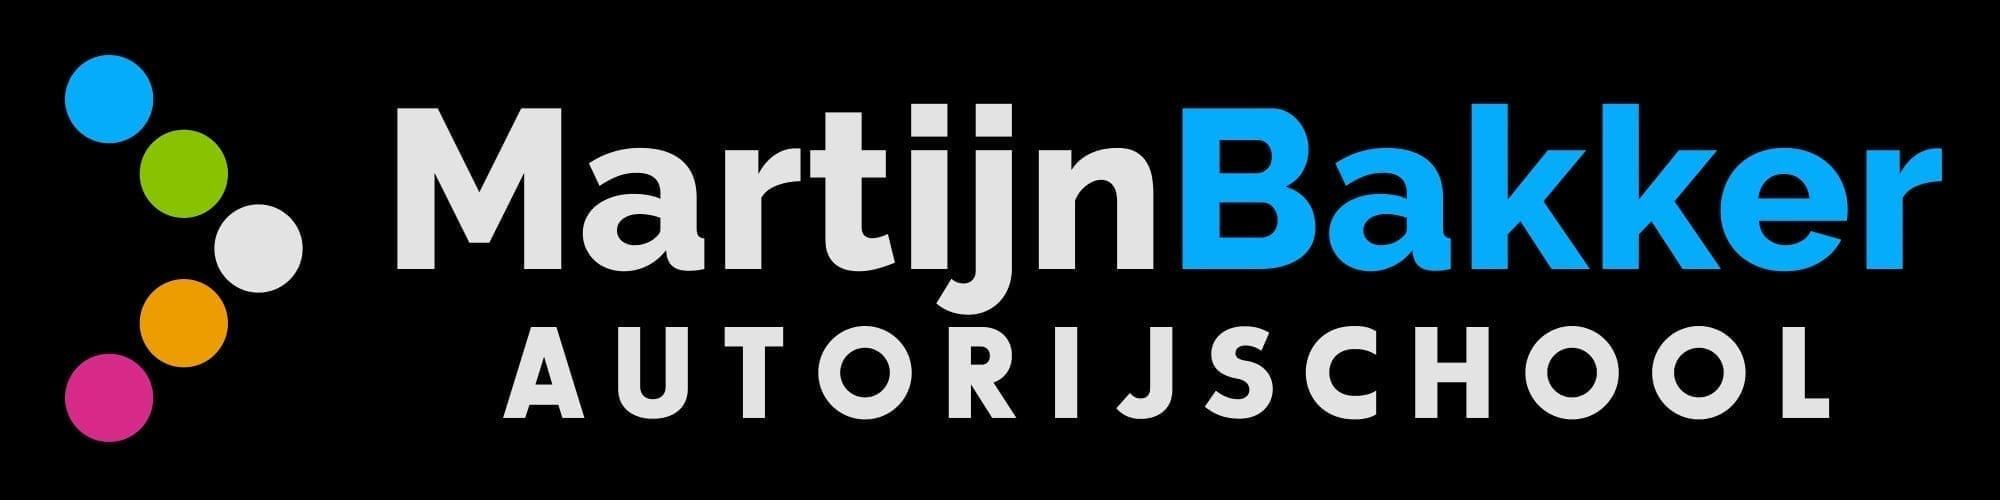 Autorijschool Martijn Bakker zwart logo